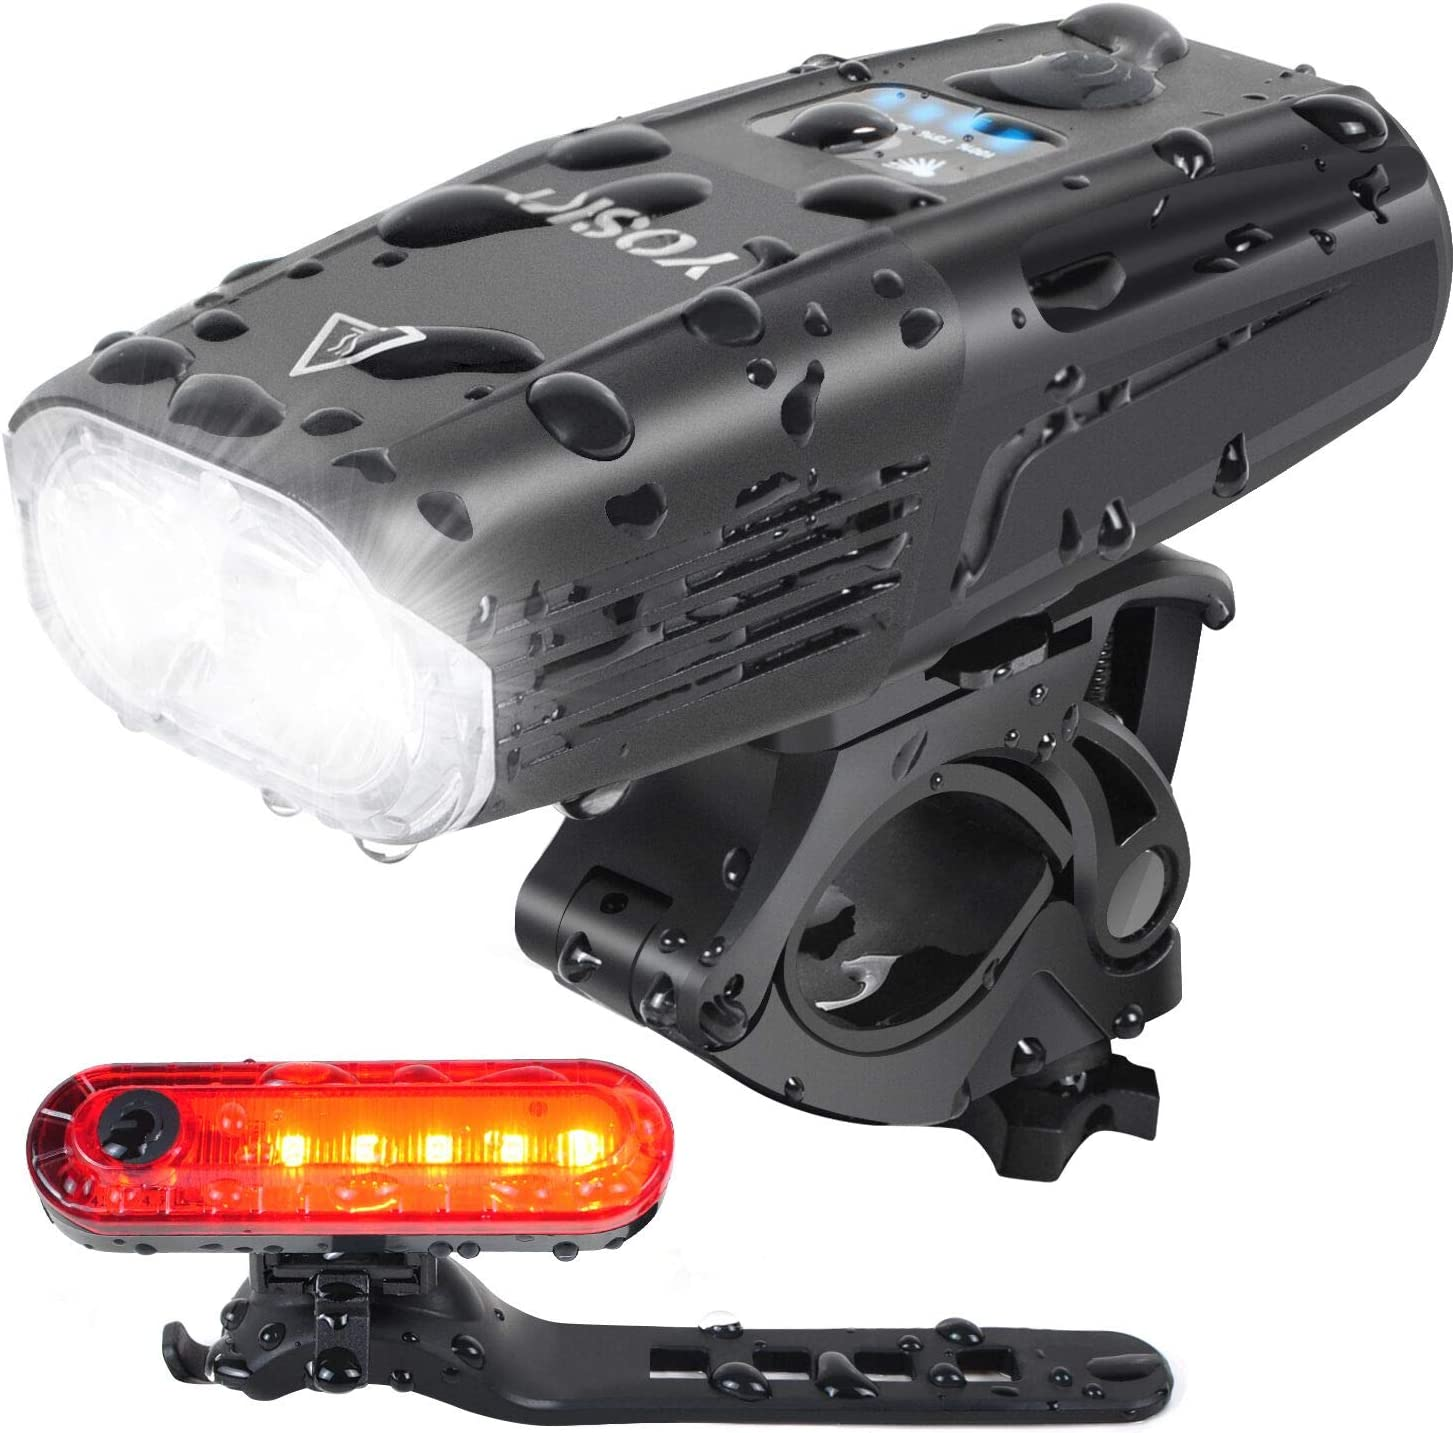 Usb Rechargeable Bike Headlight  Taillight Set 3 Led Bike Light 1000 Lumen Supe